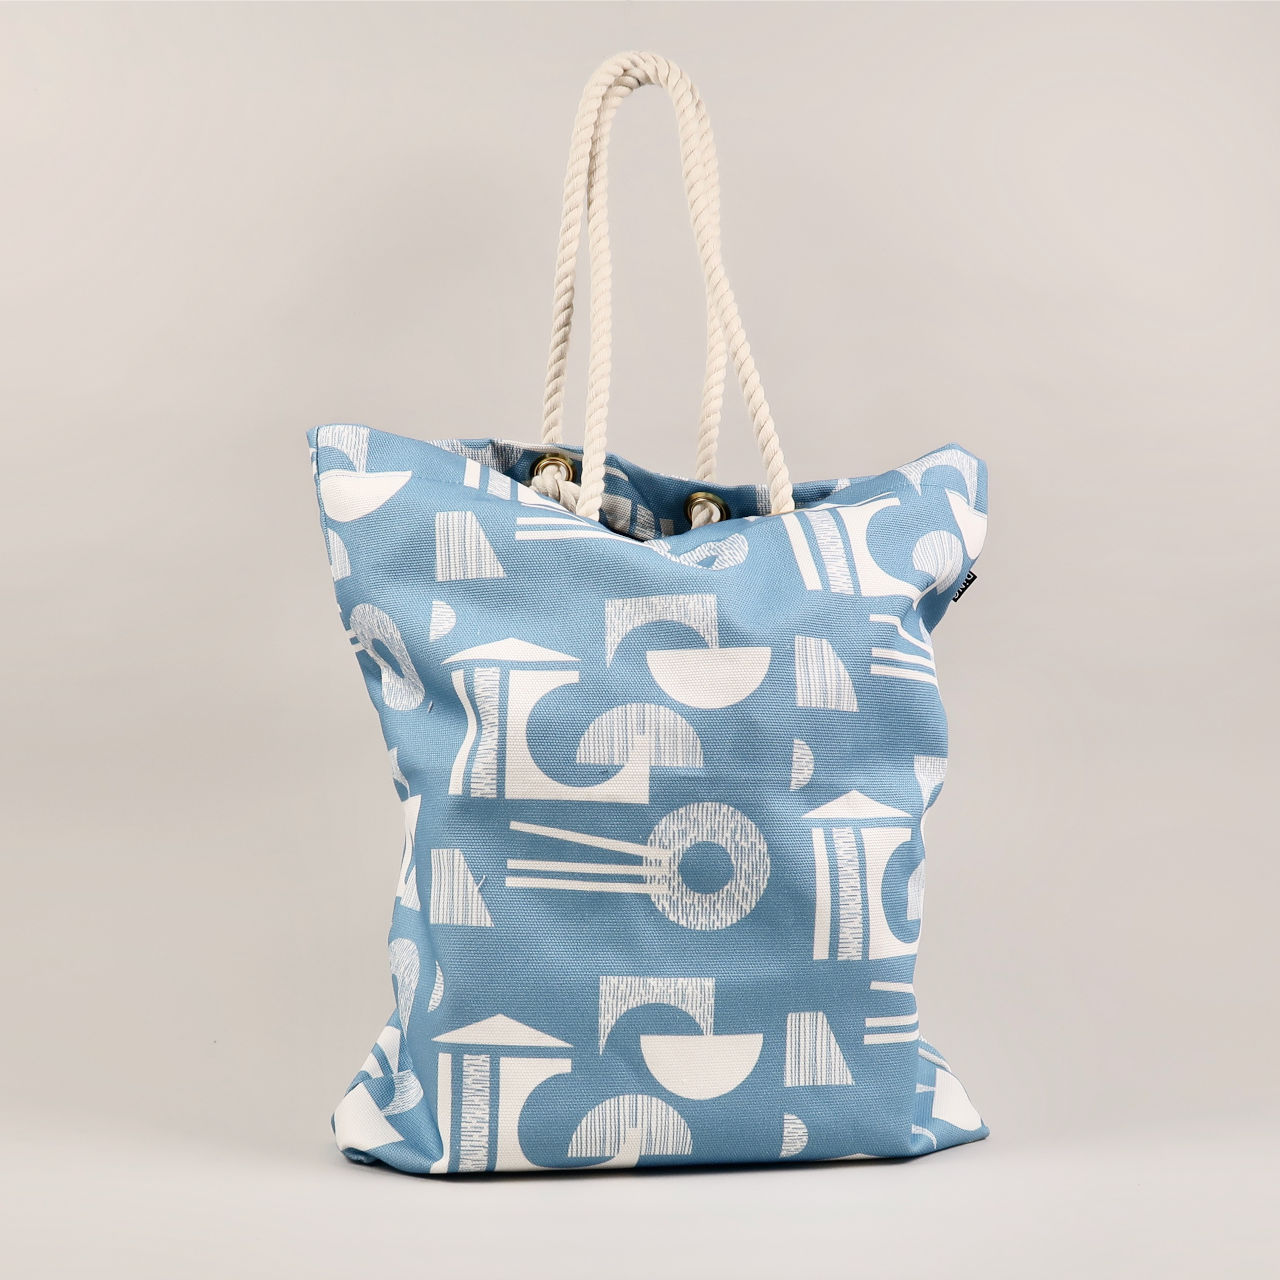 Glasses Design Tote Bag - Wedgwood Blue